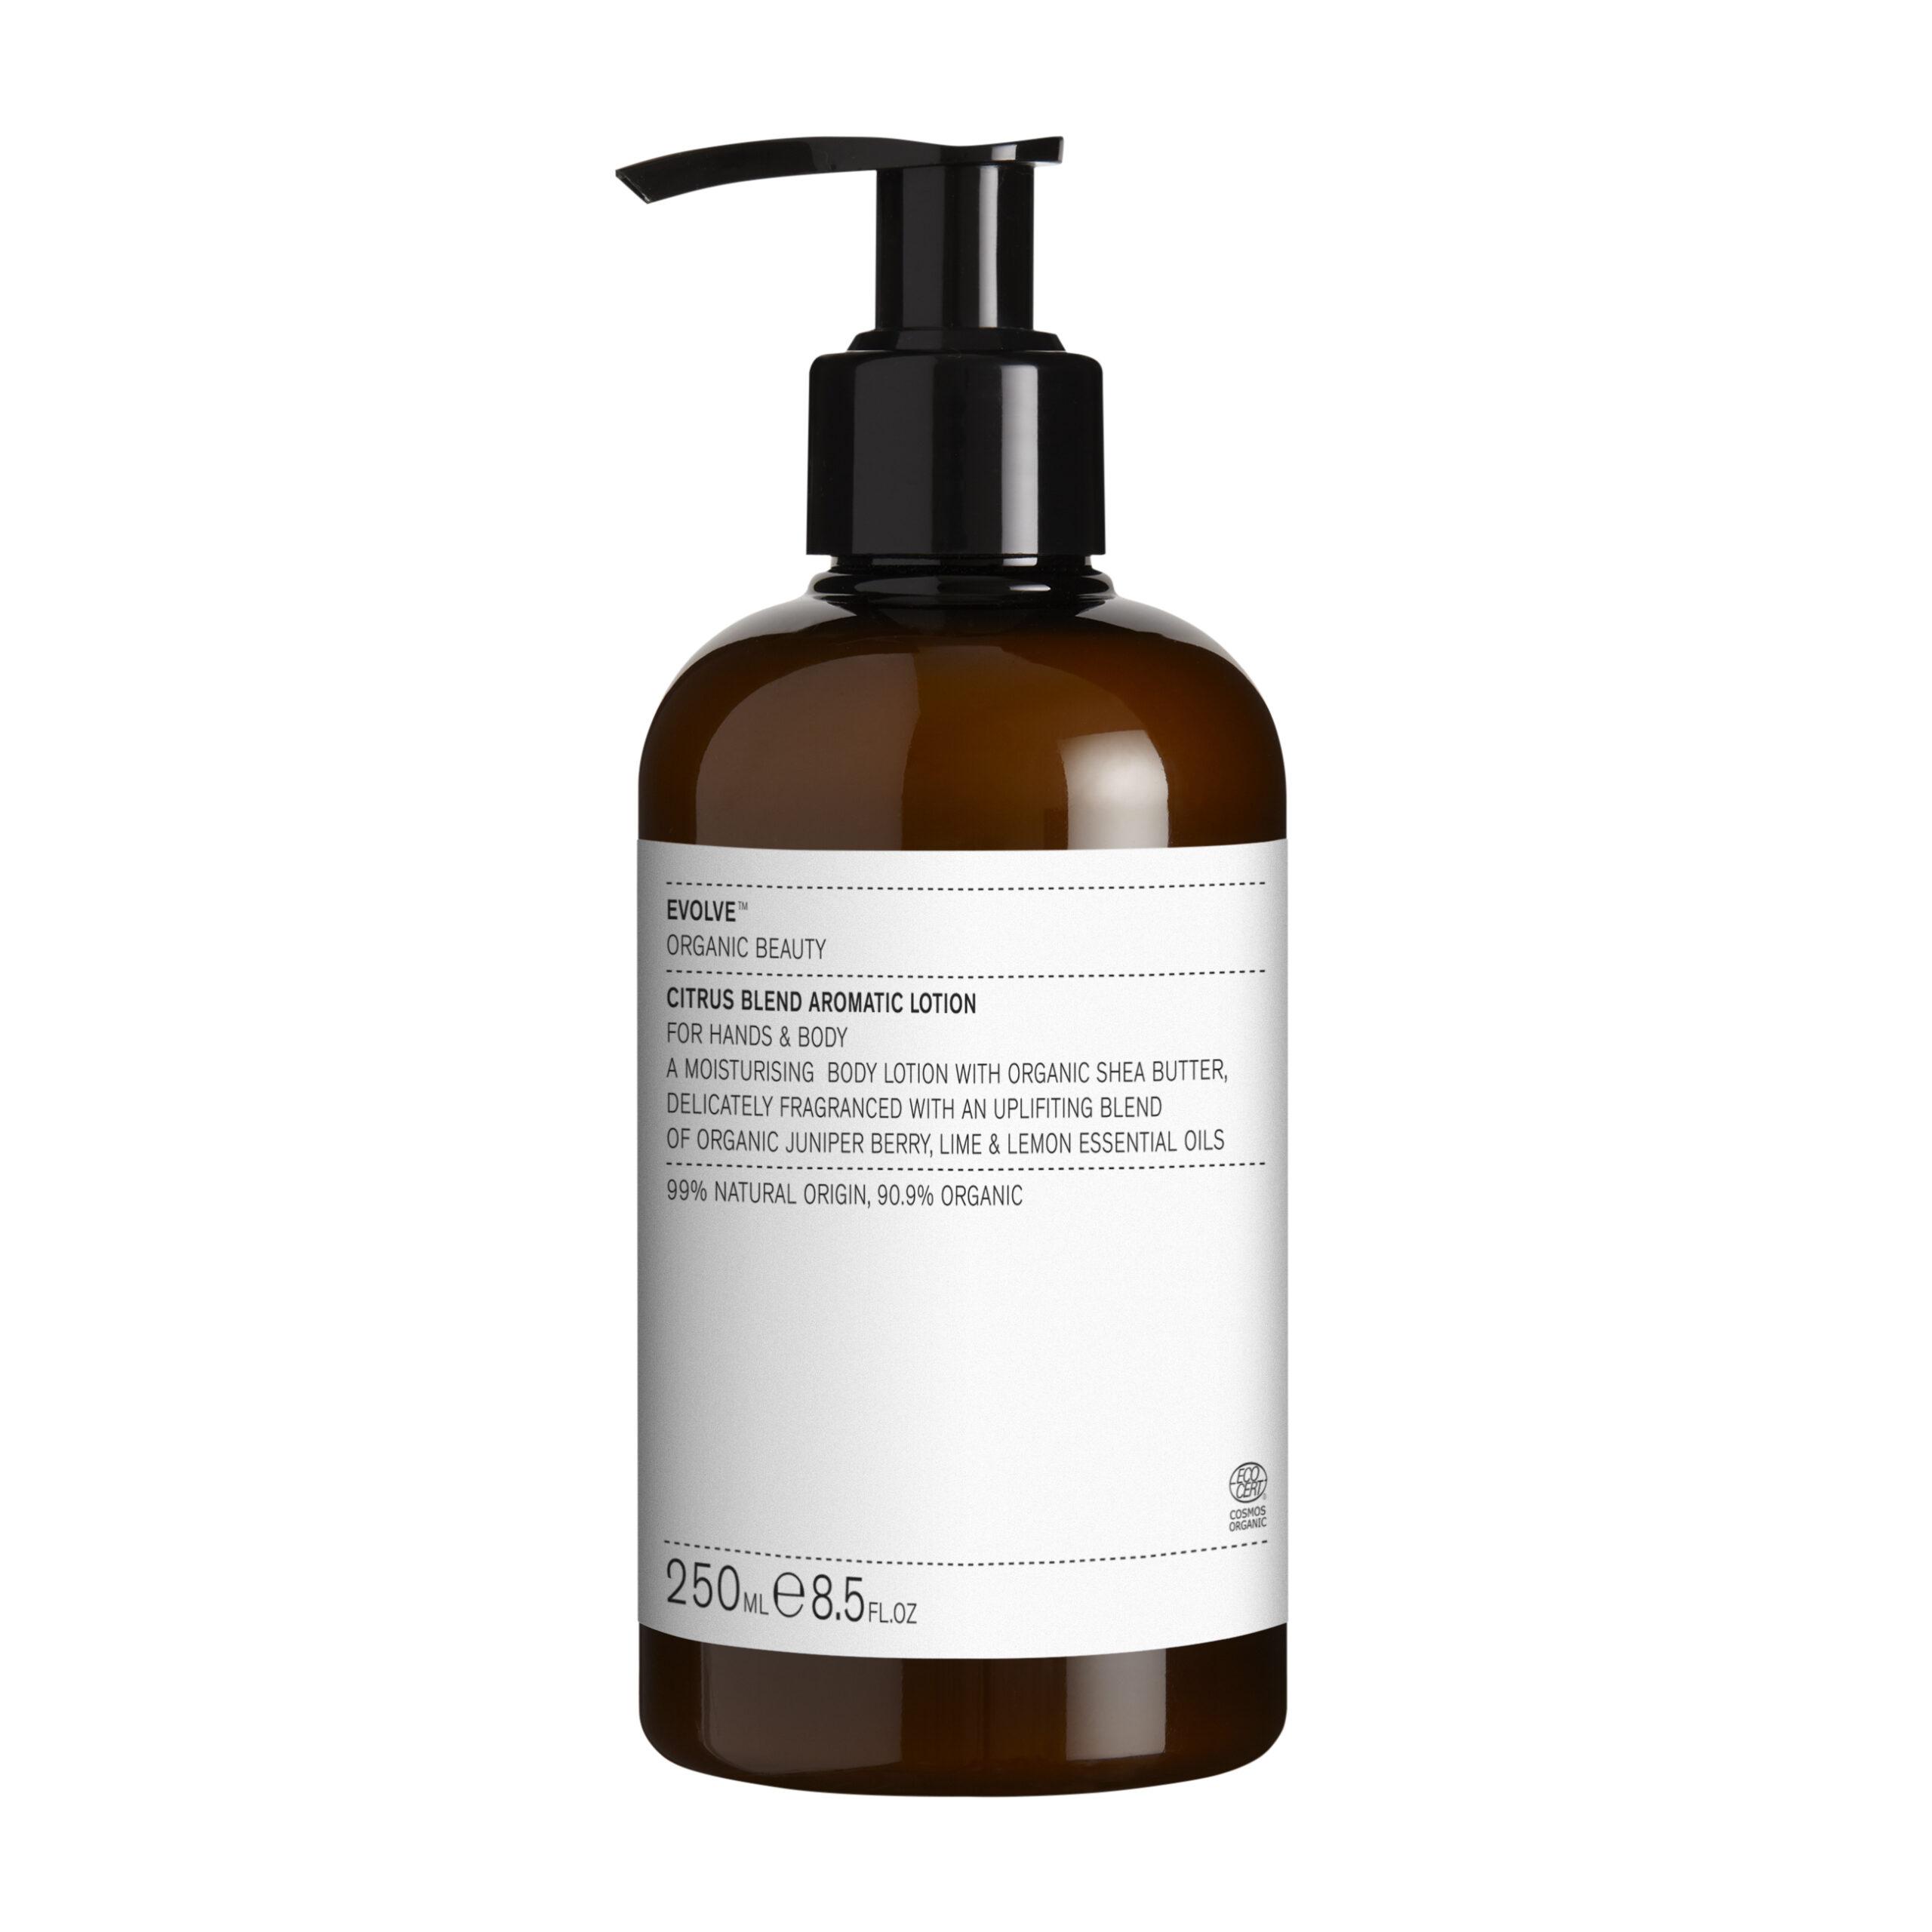 Citrus Blend Aromatic Lotion – Evolve Beauty